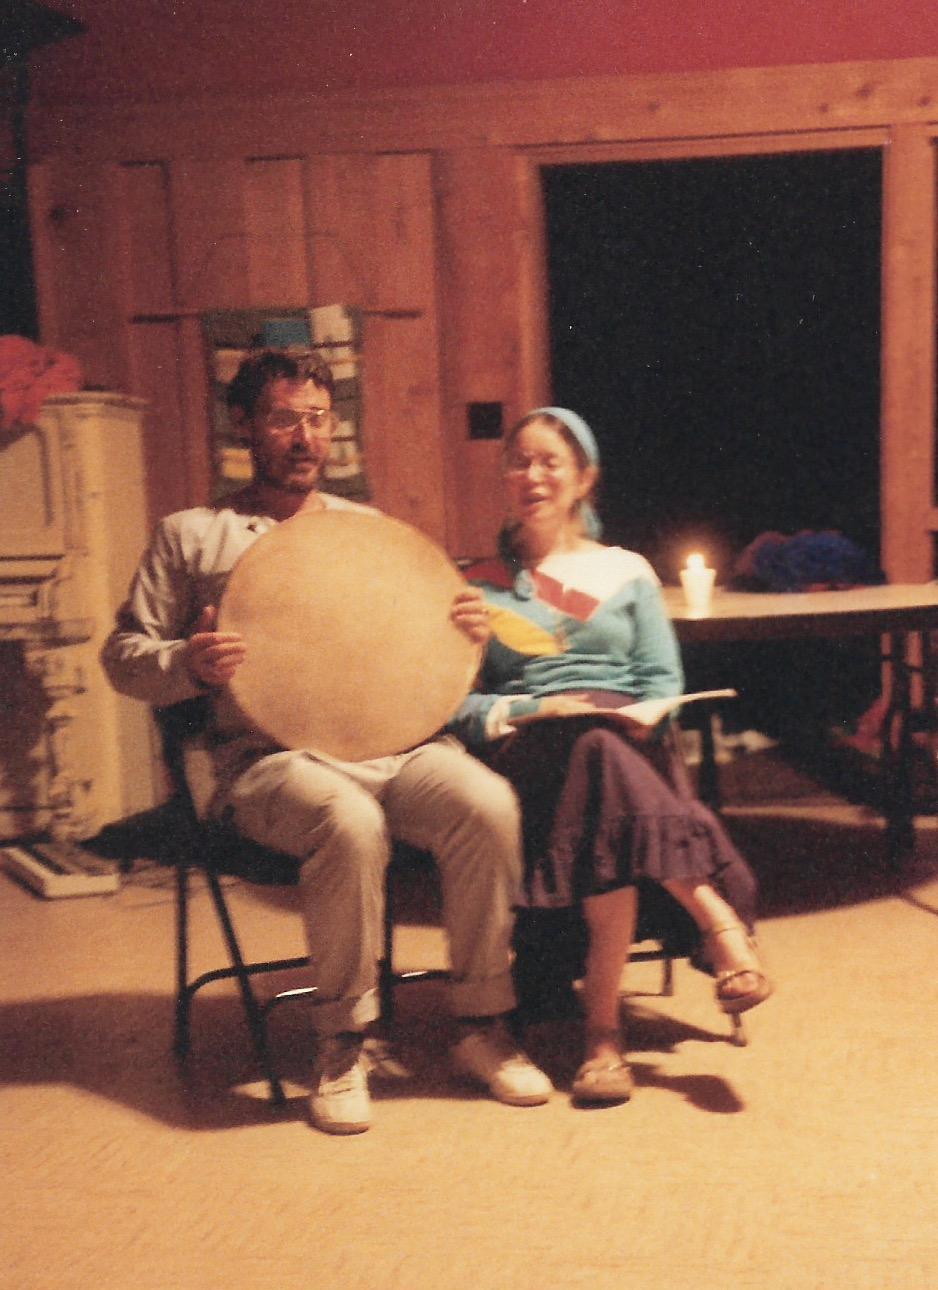 87 Joys  Saturday night talent show, Avram Davis and Sara Shendelman singing copy.jpeg